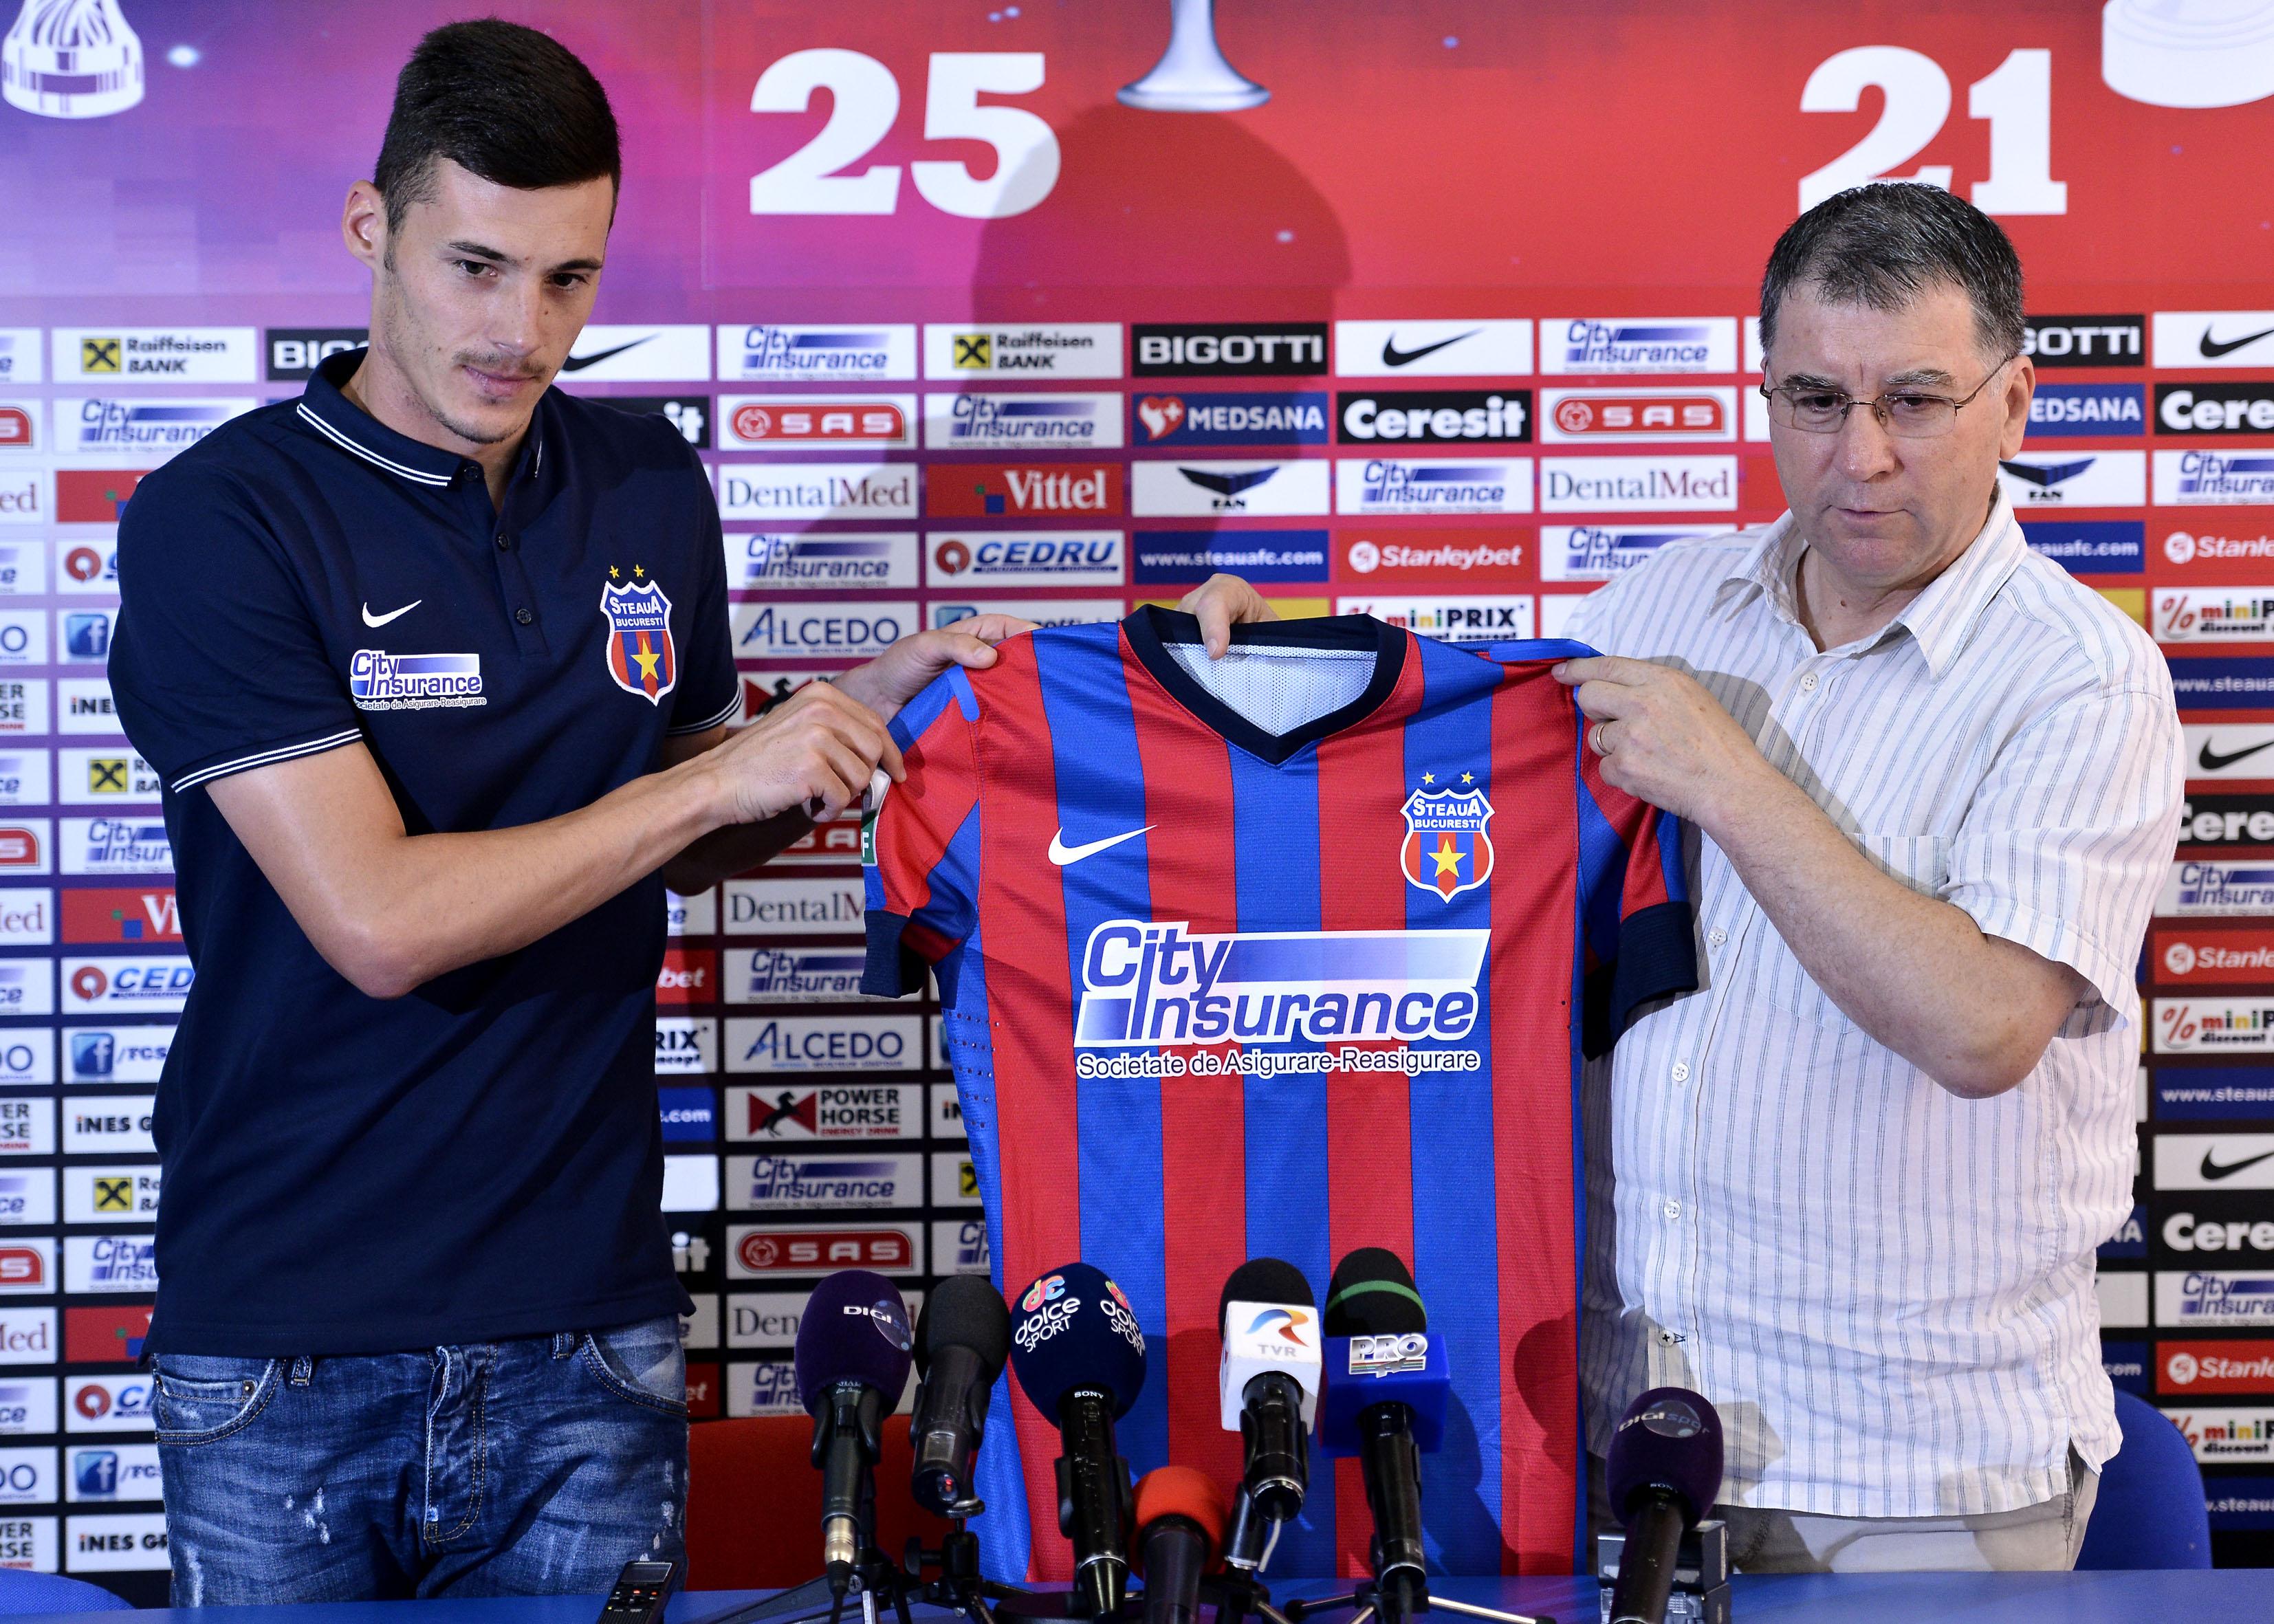 1.FOTBAL:PREZENTARE VALENTIN LEMNARU LA STEAUA BUCURESTI (25.07.2014)